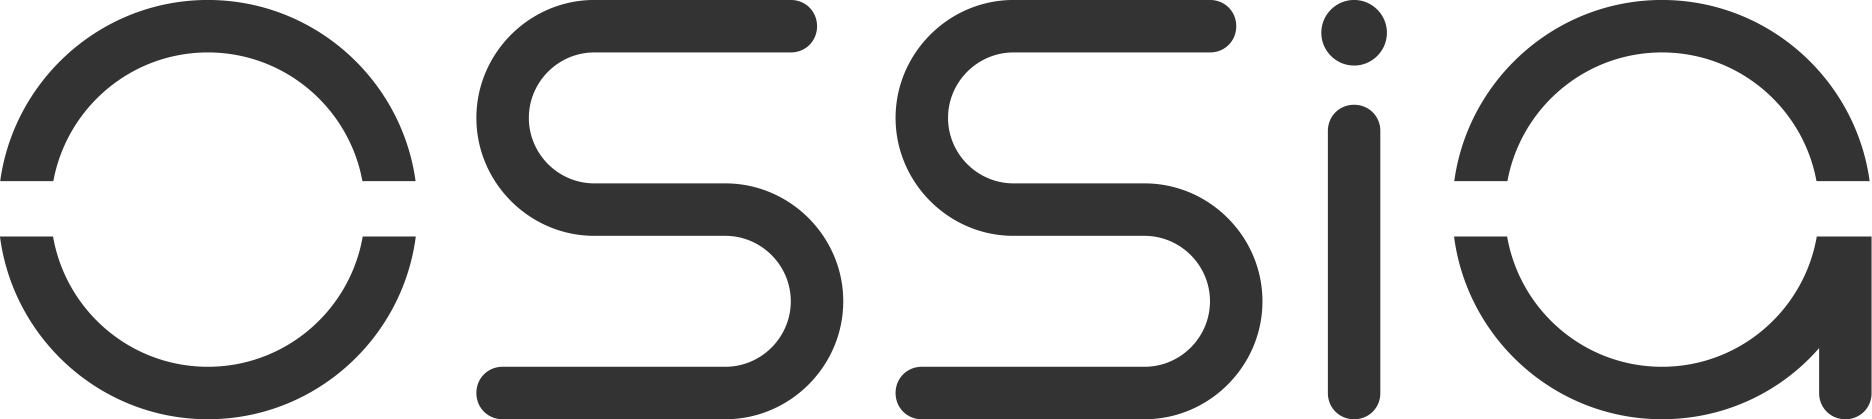 ossia_logo_dark